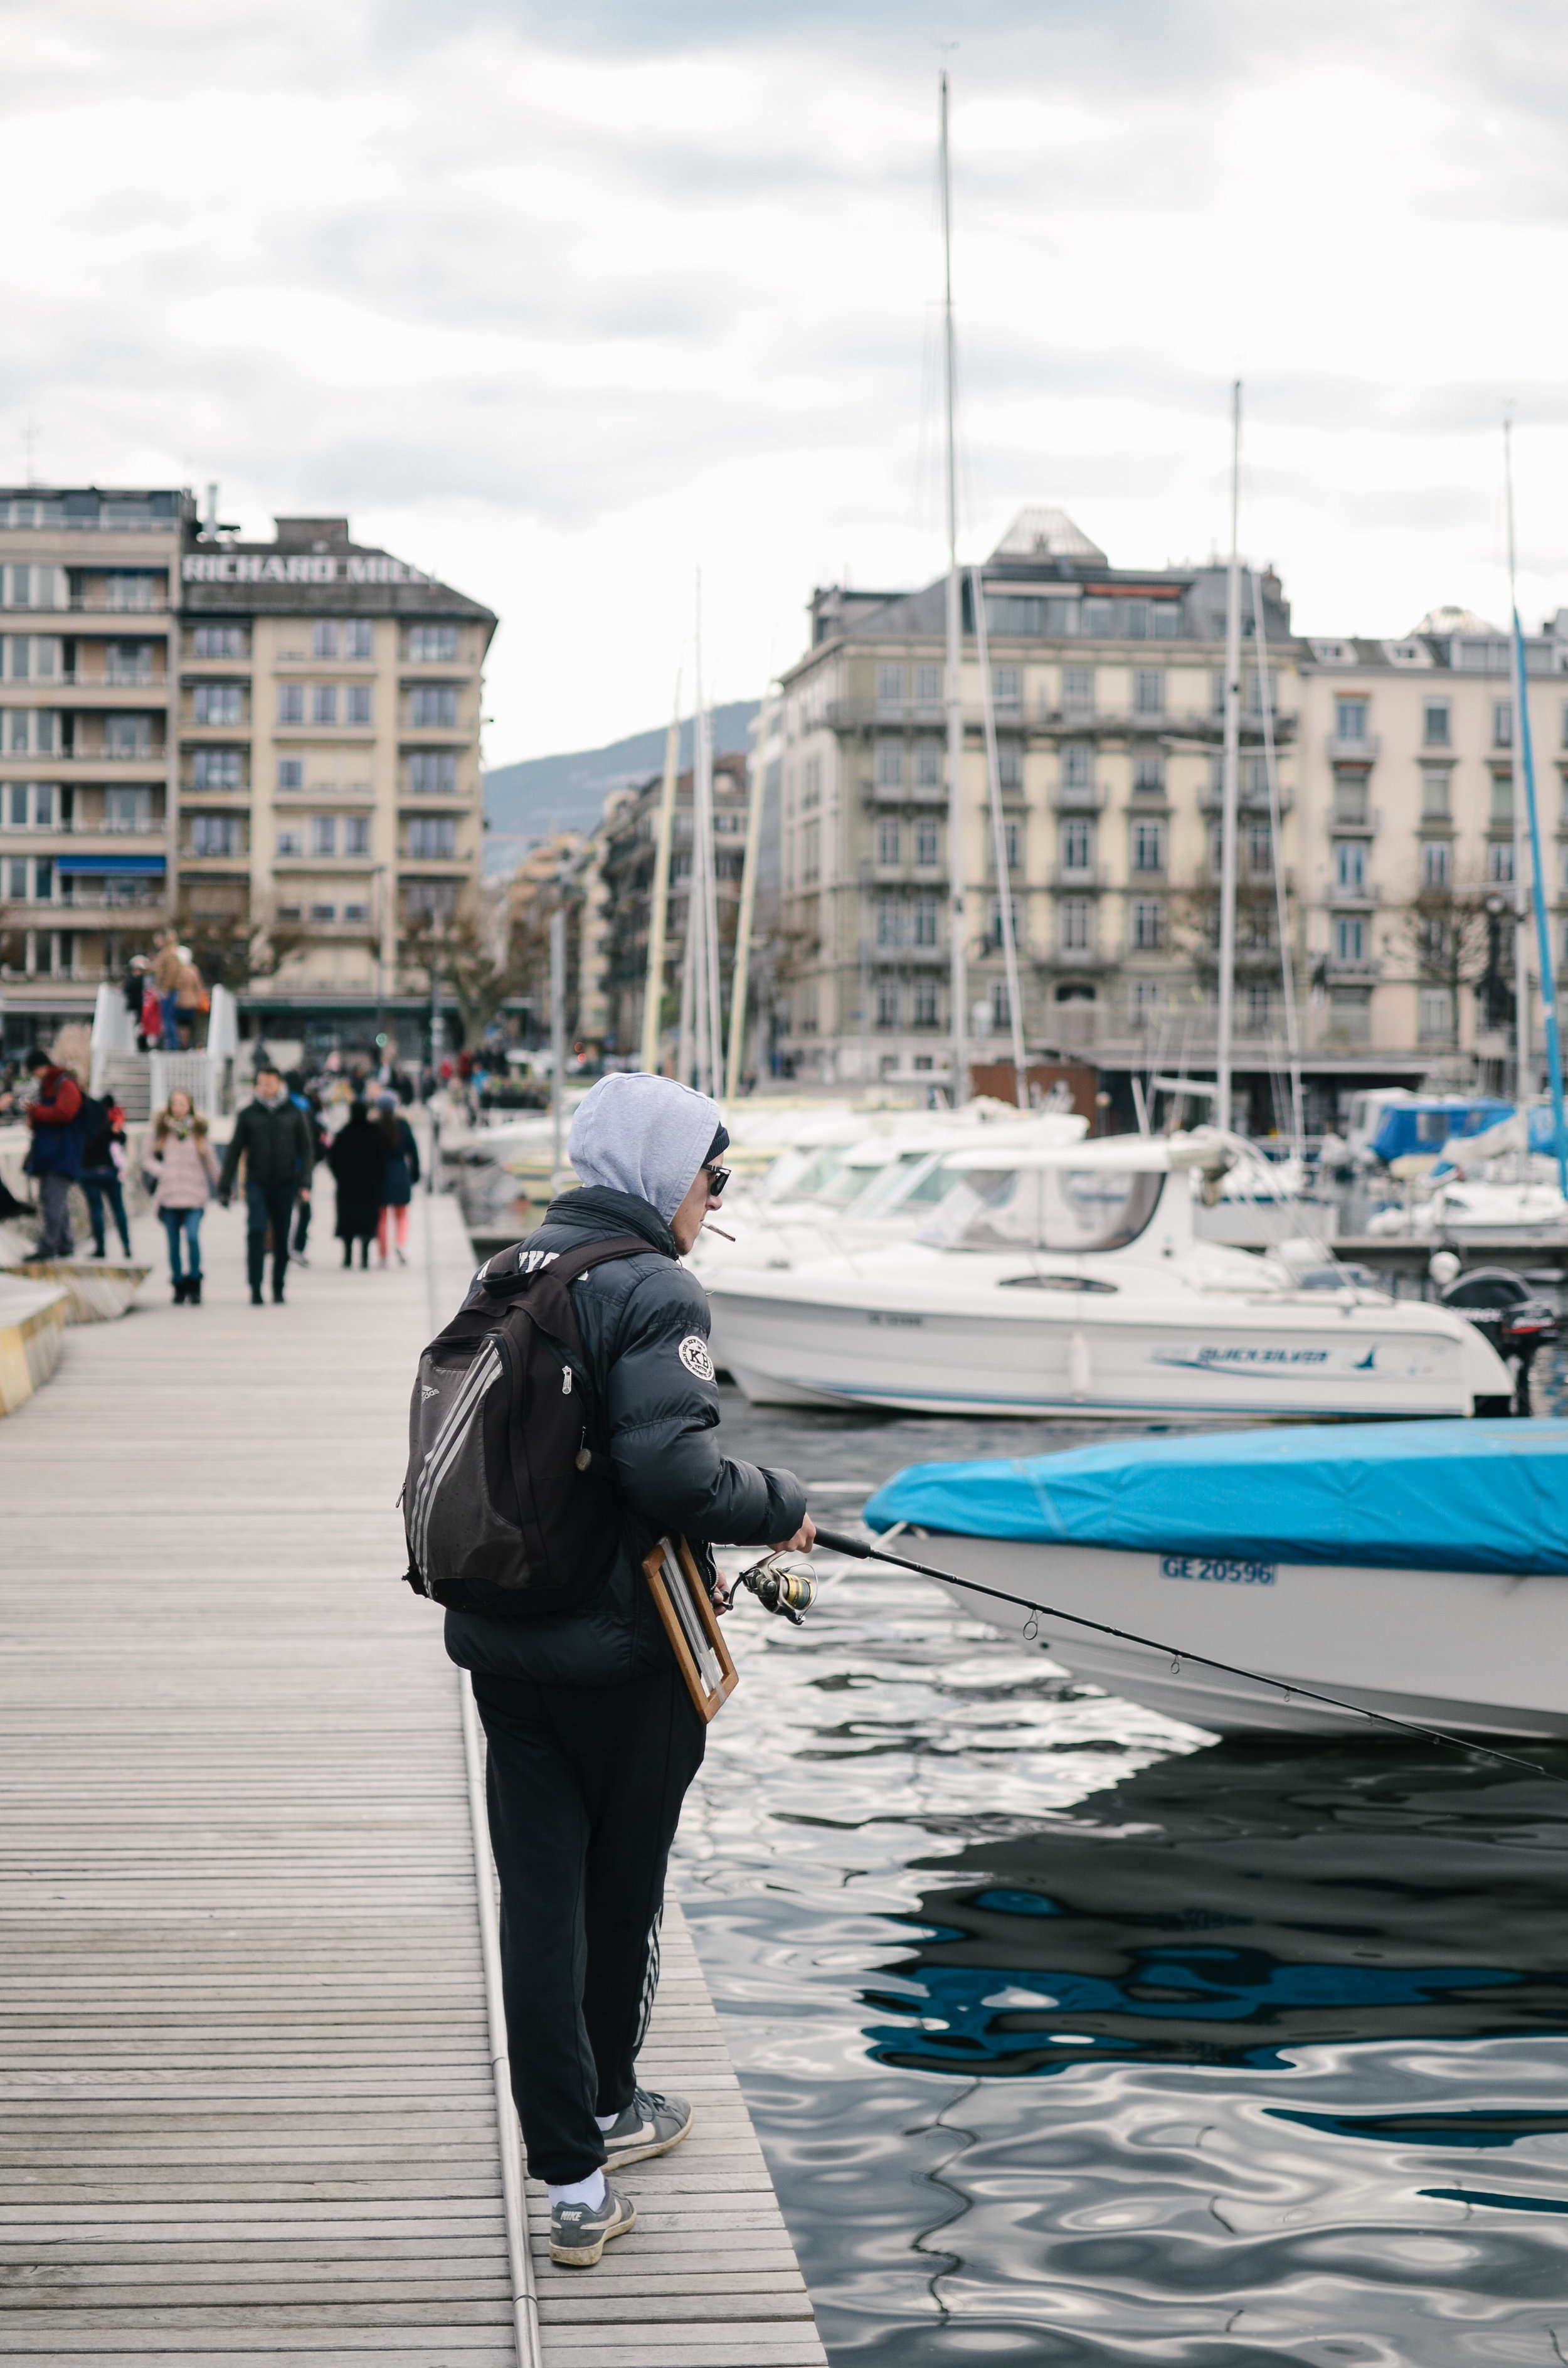 Day-Trips-From-Geneva-Switzerland_DSC_0864.jpg